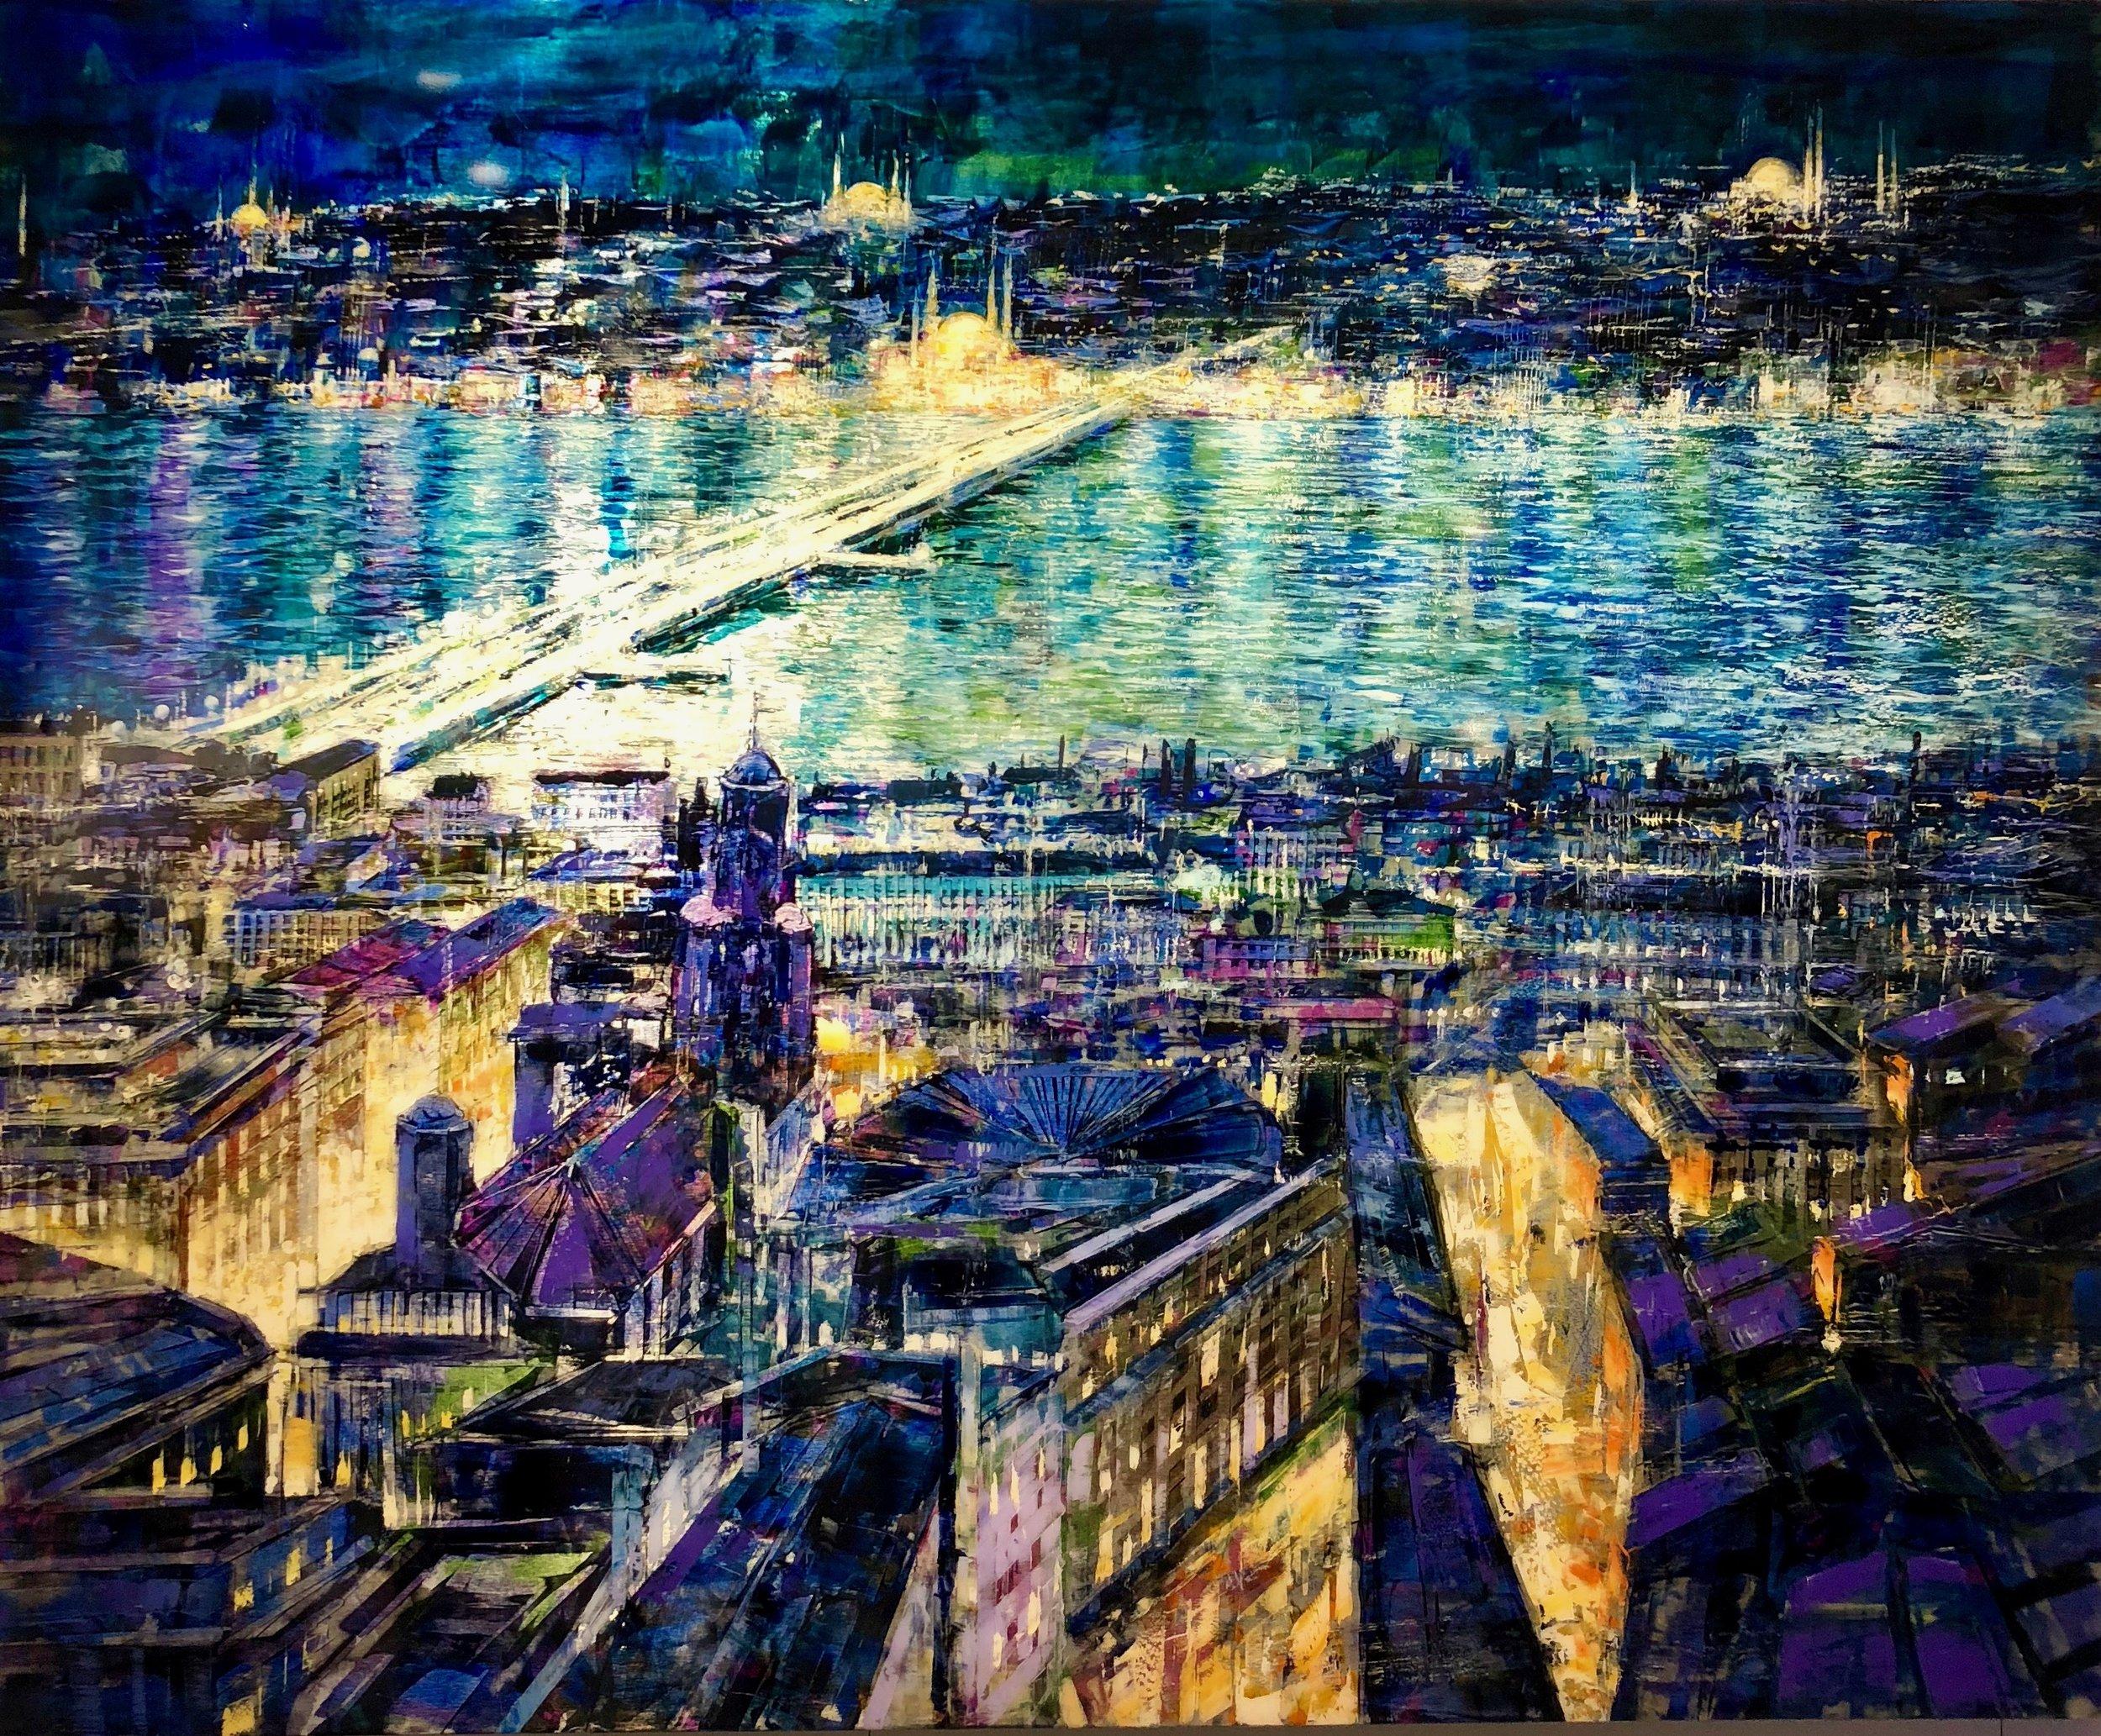 Antonio Sannino's stunning portrayal of Istanbul! At Liquid Art System